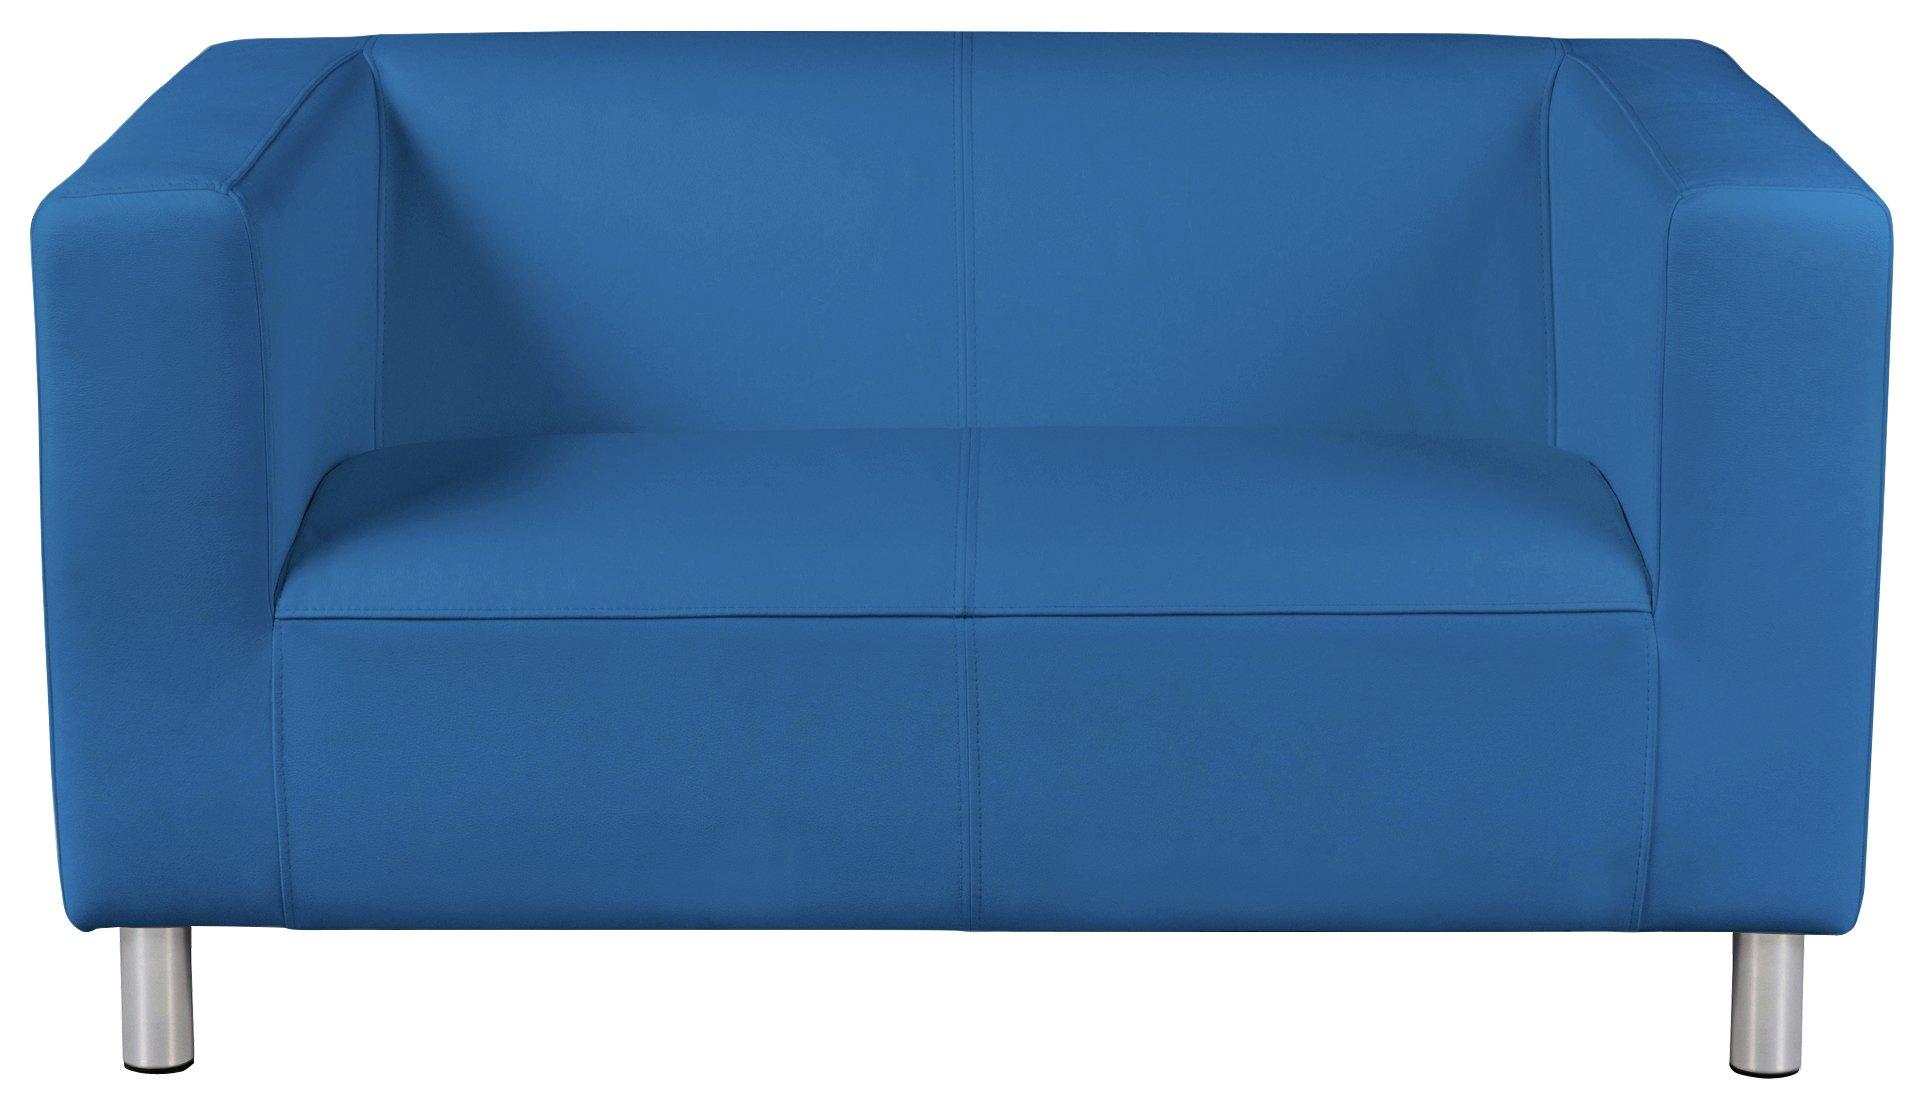 Buy ColourMatch Moda Compact 2 Seater Fabric Sofa - Marina ...